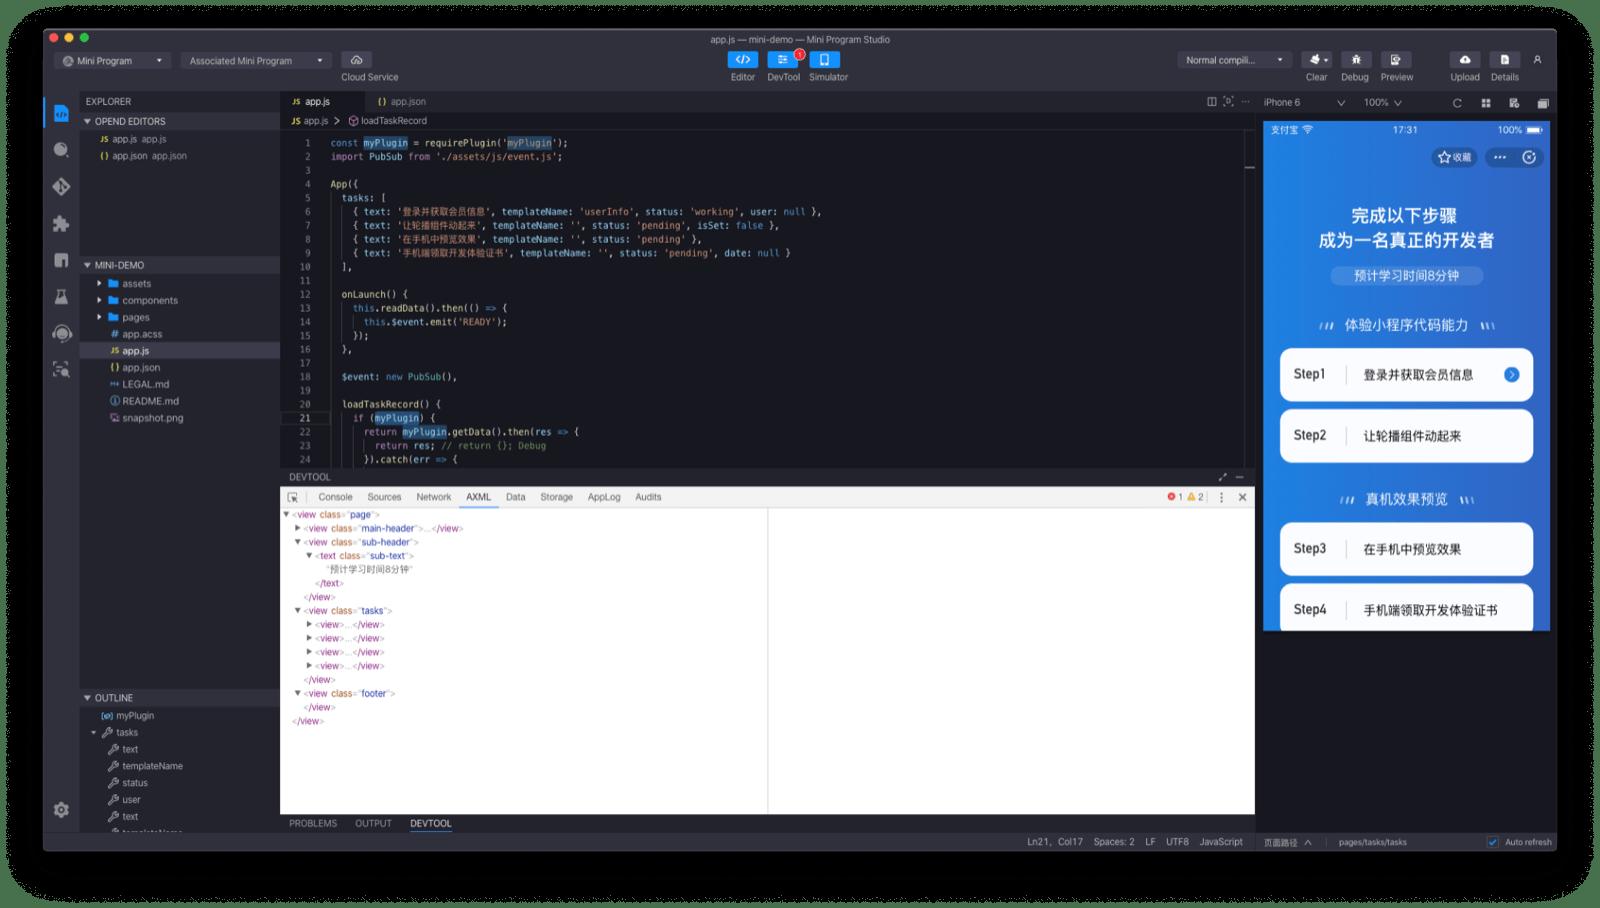 Alipay DevTools application window showing code editor, simulator, and debugger.